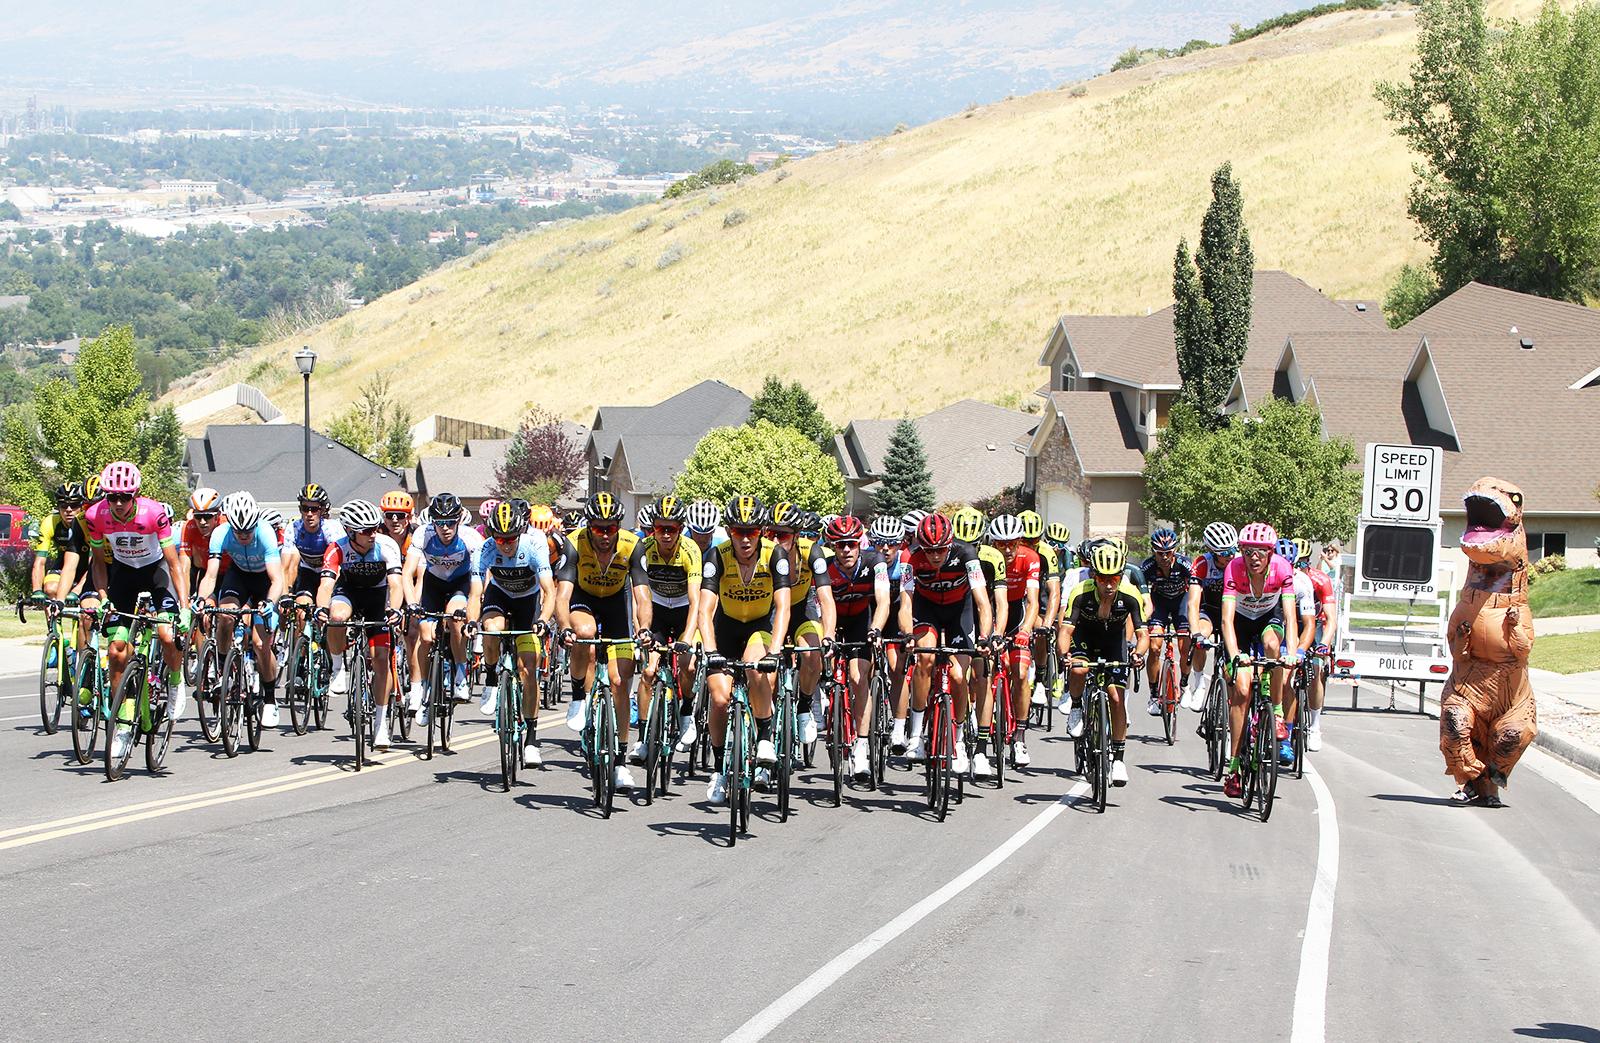 The peloton climbs the neighbourhood of Eagle Ridge Road alongside T-Rex.  2018 Tour of Utah Stage 3, August 8, 2018, Layton, Utah. Photo by Cathy Fegan-Kim, cottonsoxphotography.net